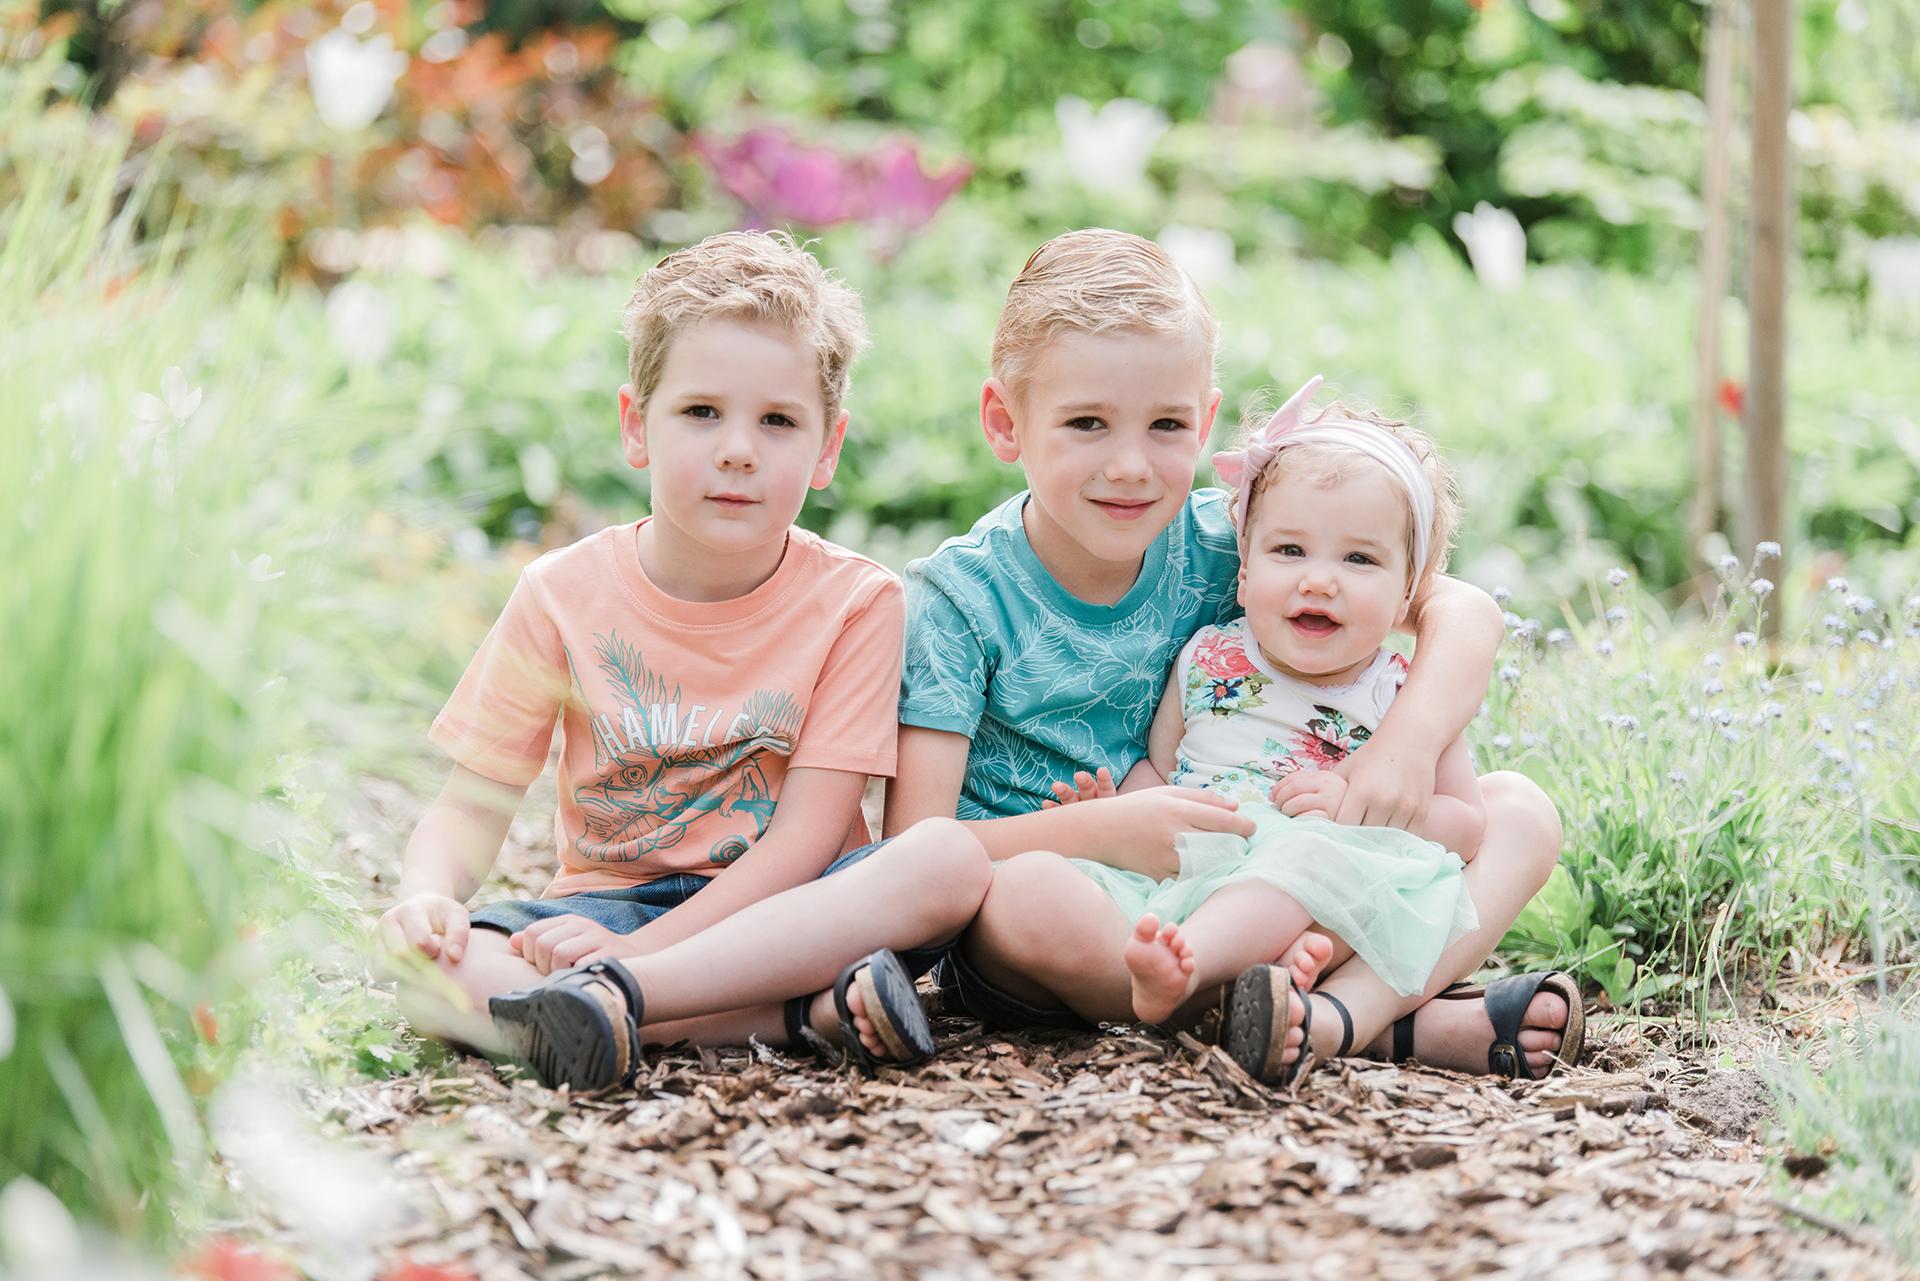 Chantal-Nijhof-Studio-Fotografie-Fotograaf-Heerde-Epe-Oene-Wapenveld-Veessen-Kids-fotoshoot-Kinder-fotoshoot